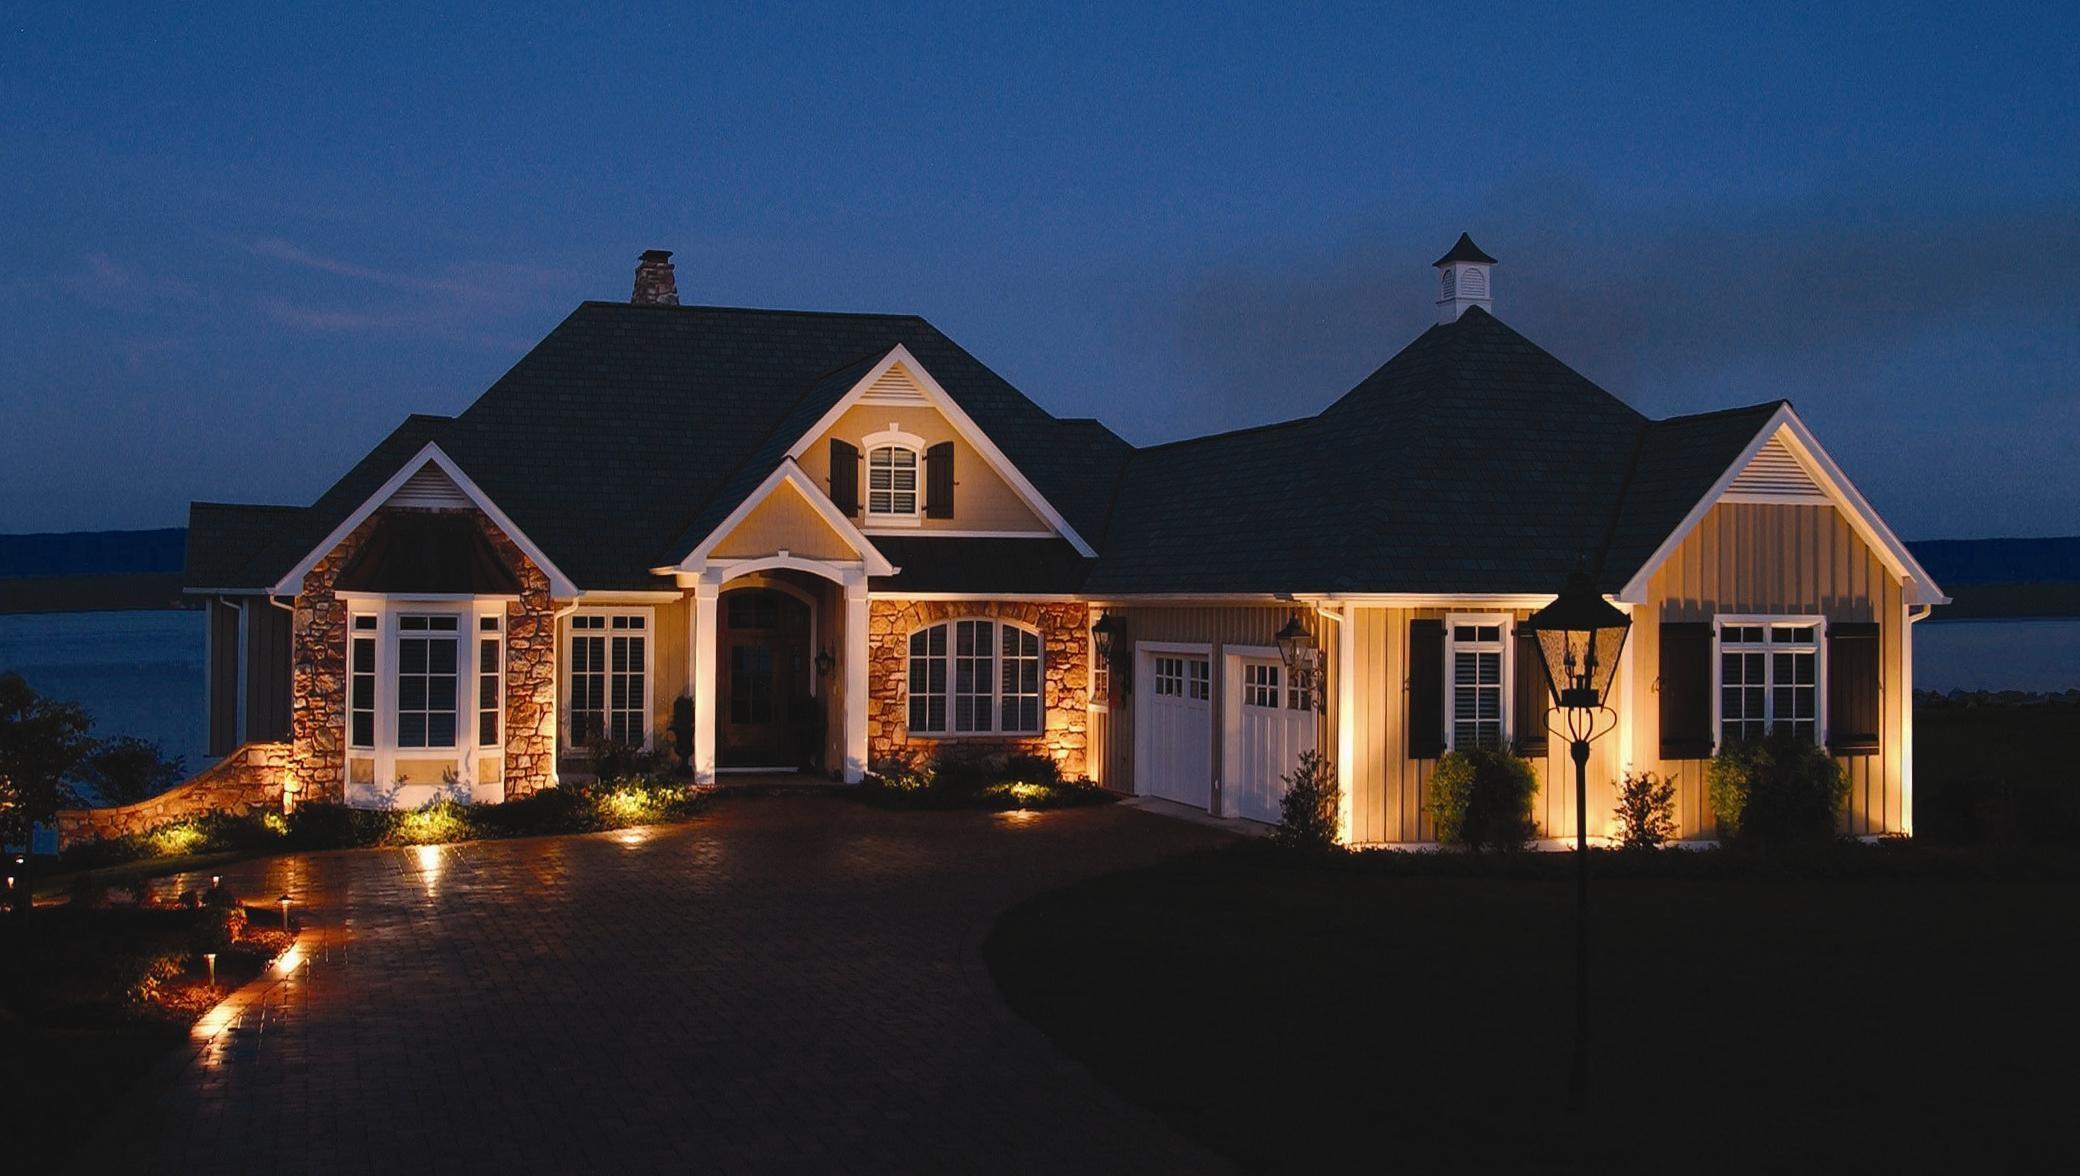 Outdoor Lighting Perspectives of Louisville image 7